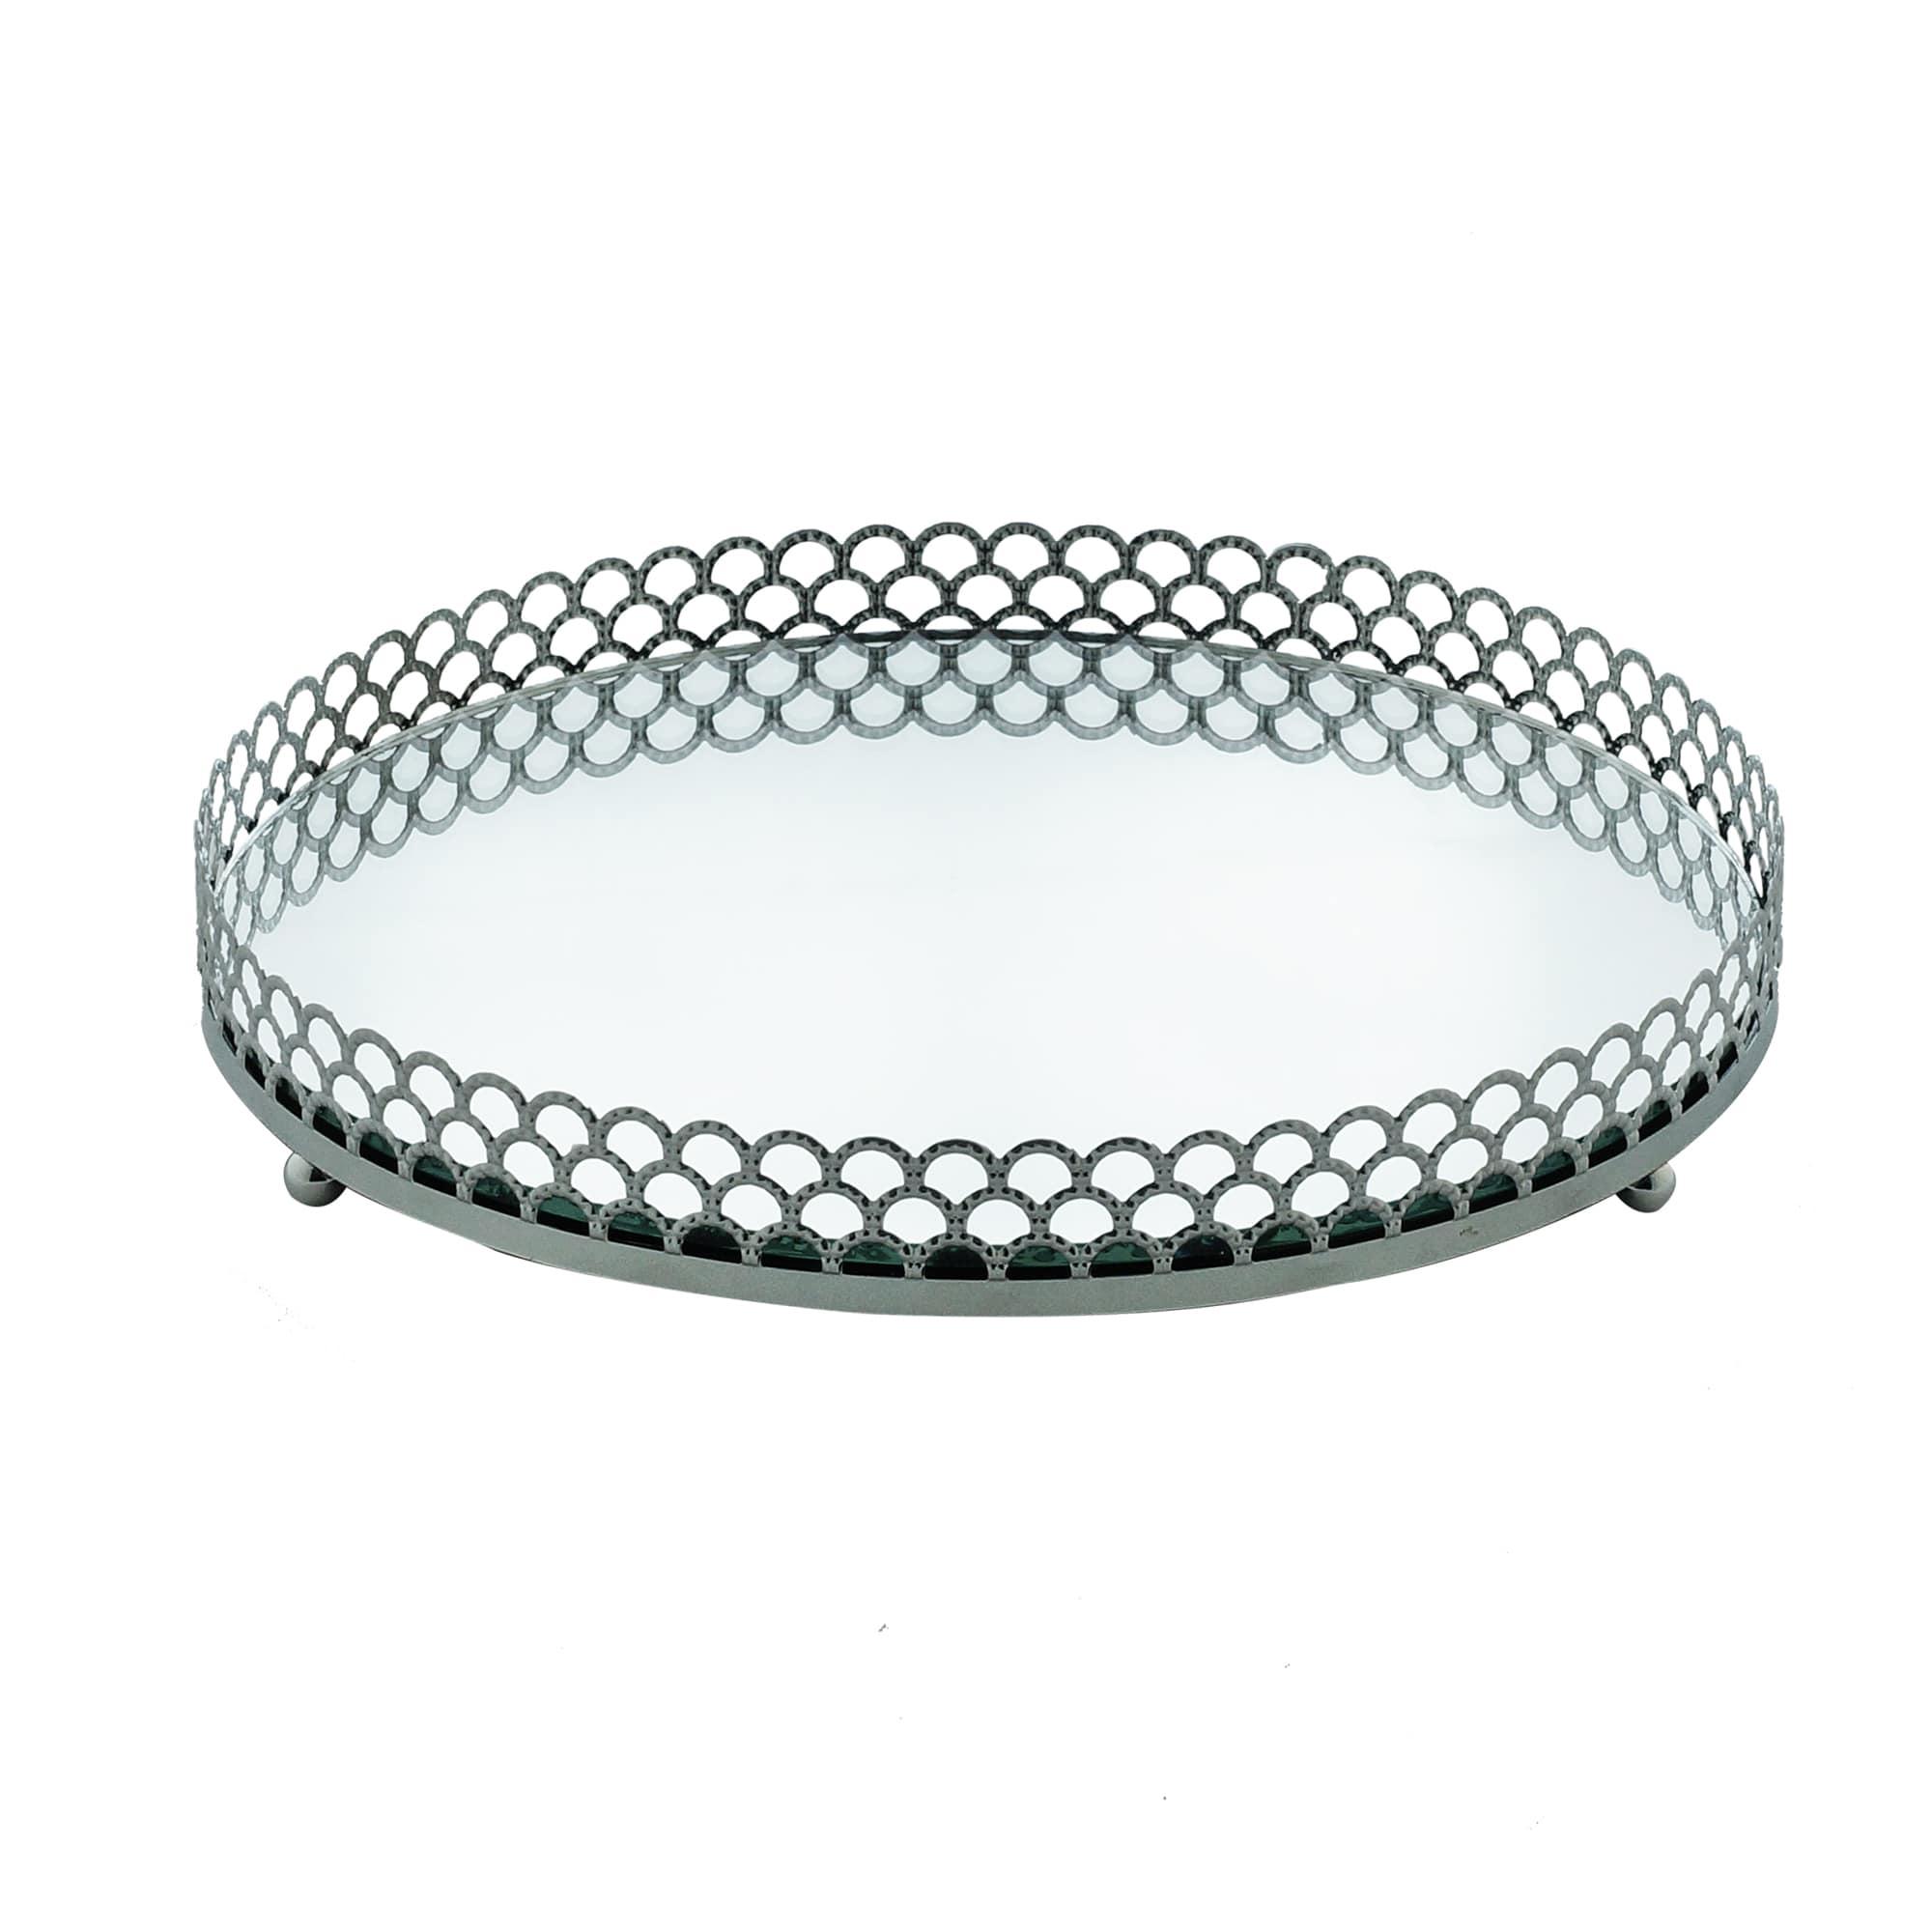 Bandeja Espelhada Prata de Metal - Luxo para Lavabo / Bar / Sala 20 x 20 x 3 cm